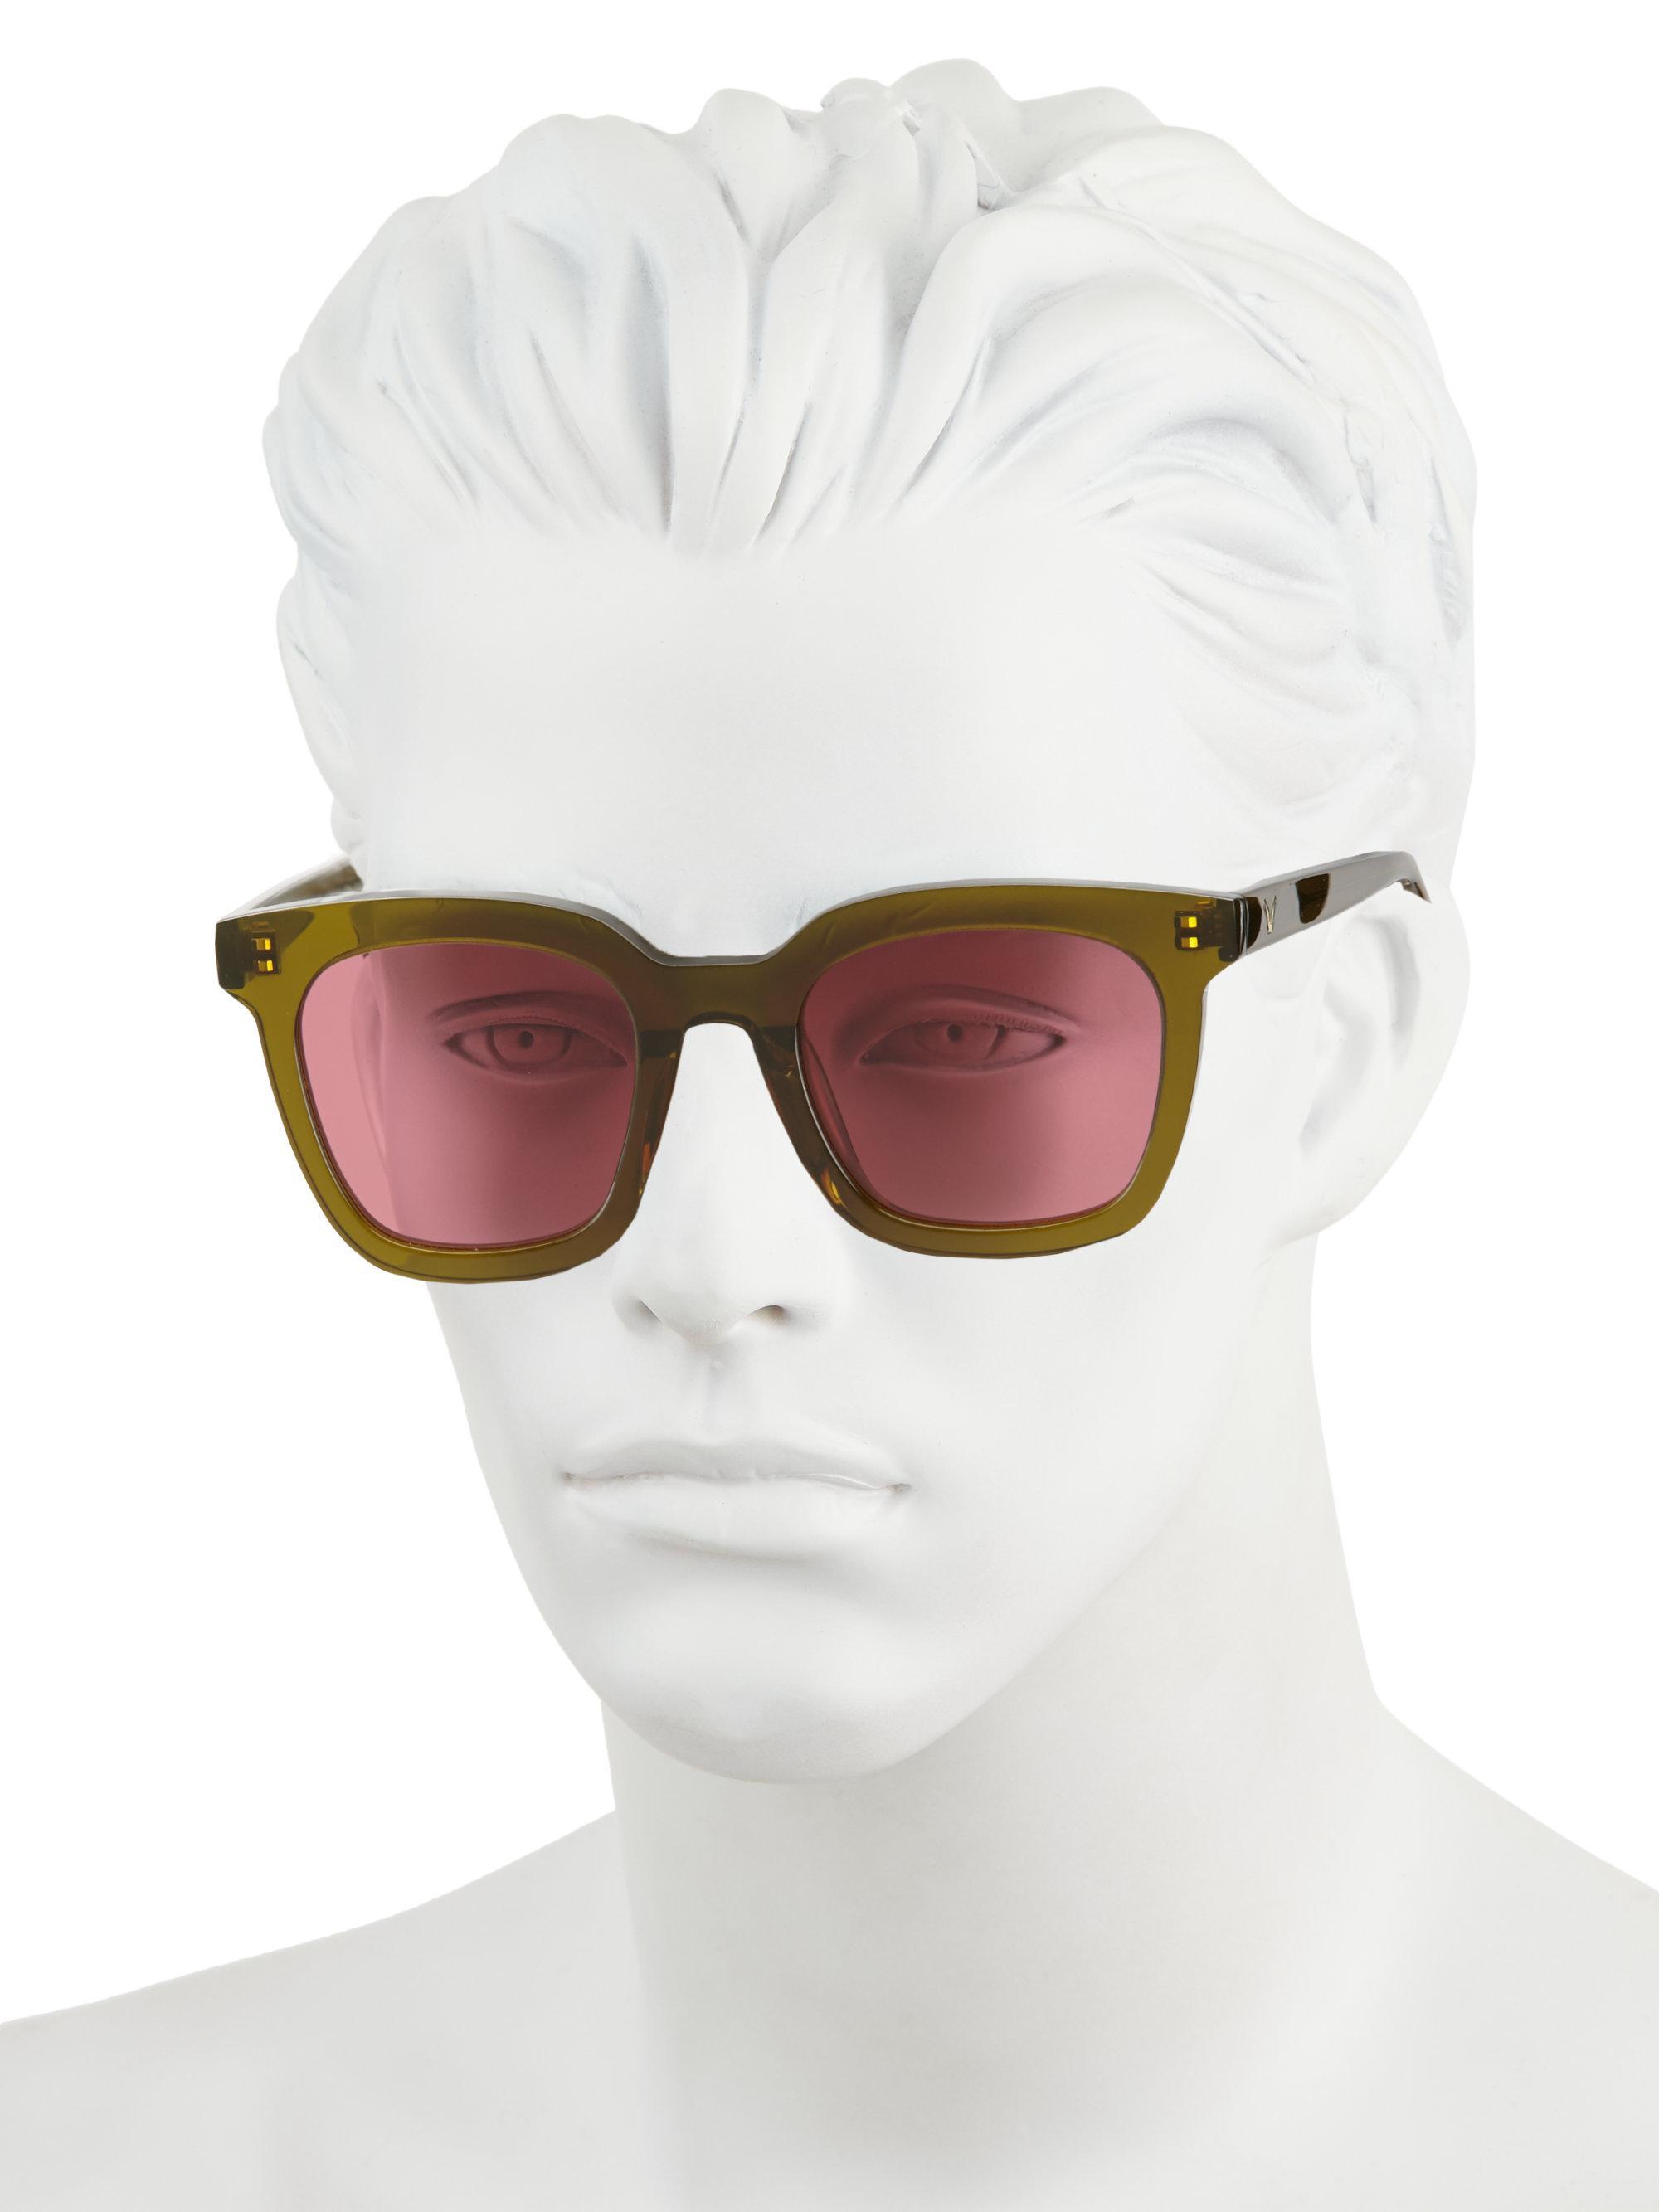 c7185d20169c Lyst - Gentle Monster Finn Retro Square Sunglasses in Pink